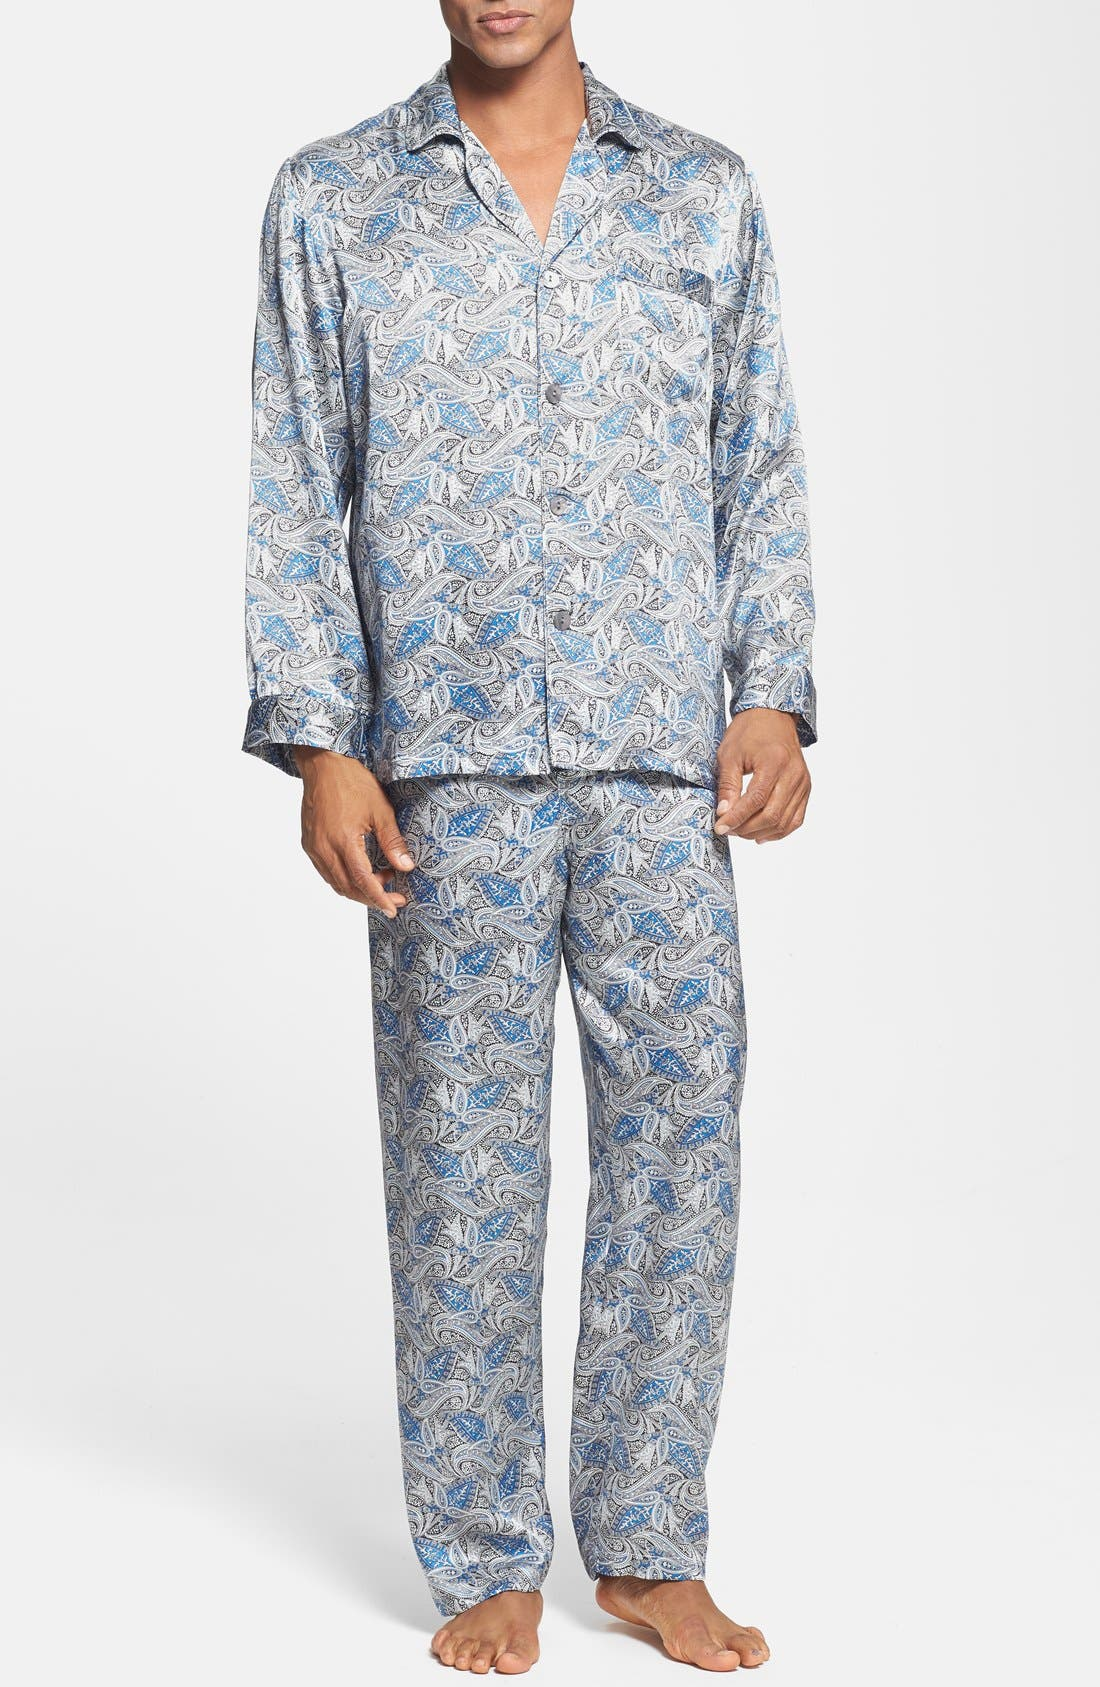 1940s Men's Underwear: Briefs, Boxers, Unions, & Socks Mens Majestic International Cypress Silk Pajamas Size XX-Large - Blue $325.00 AT vintagedancer.com